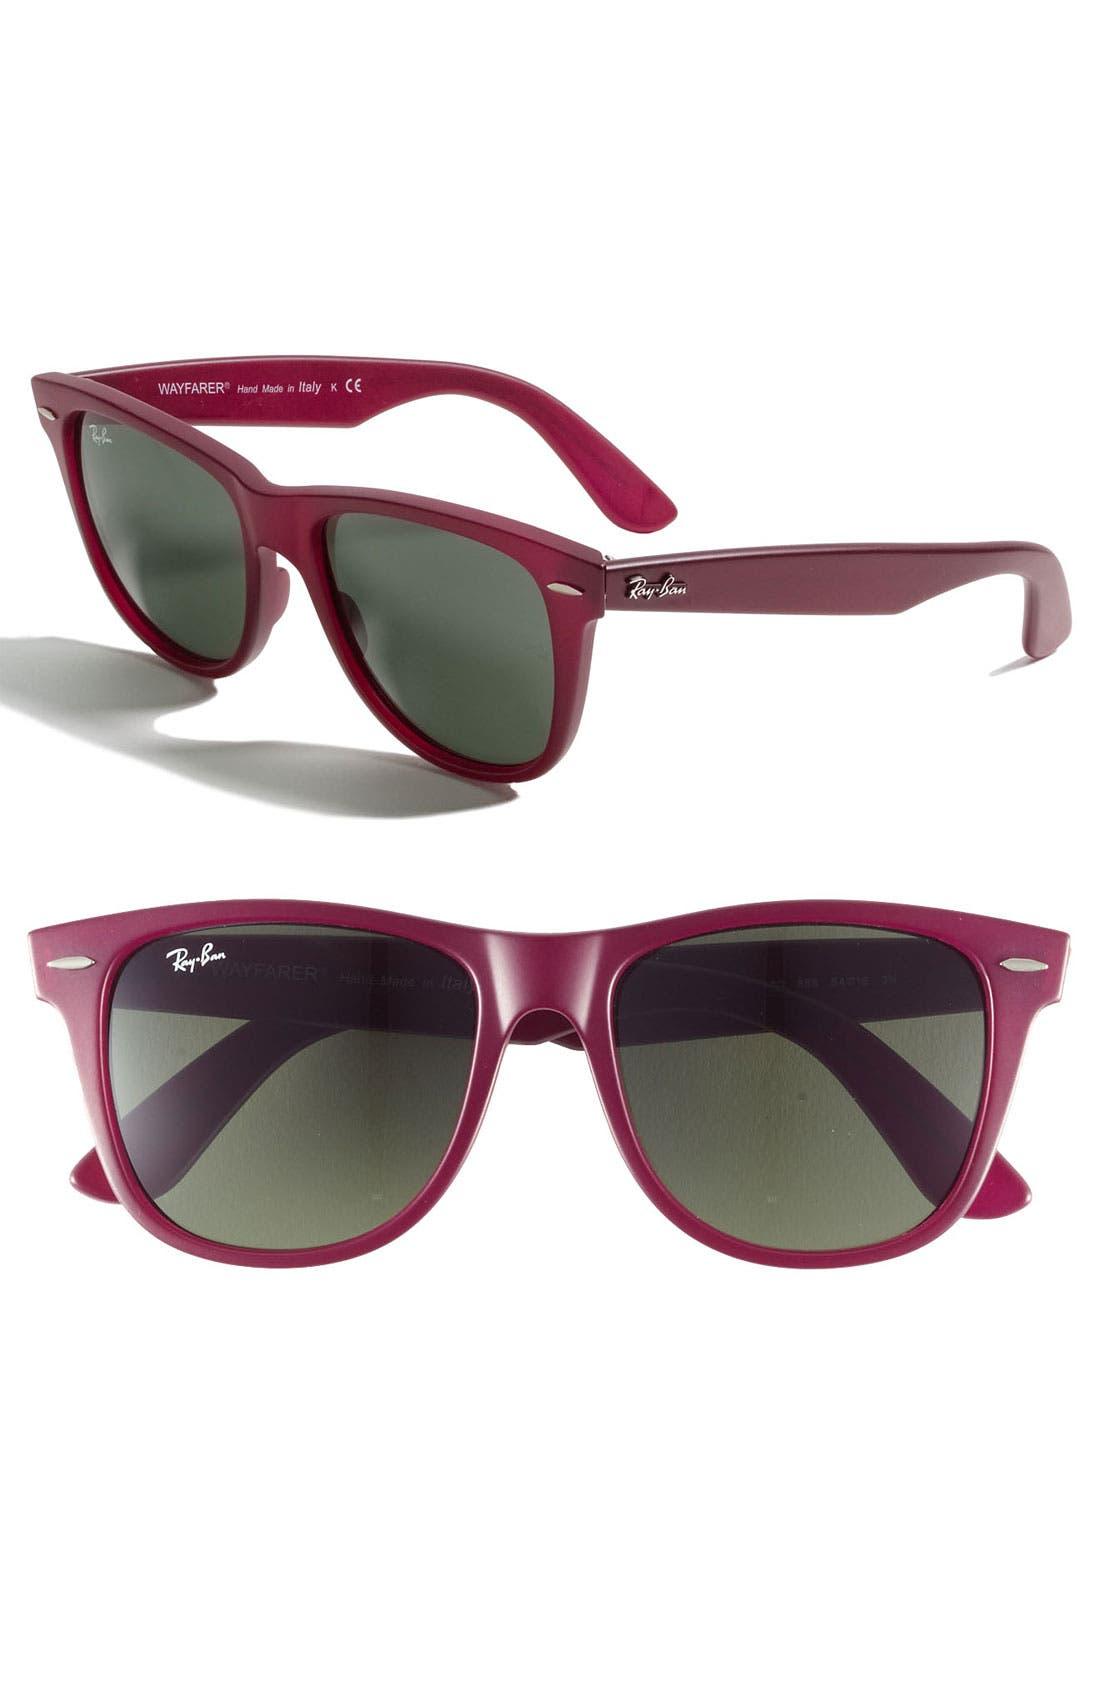 Large Classic Wayfarer 54mm Sunglasses,                             Main thumbnail 1, color,                             Matte Red/ Green